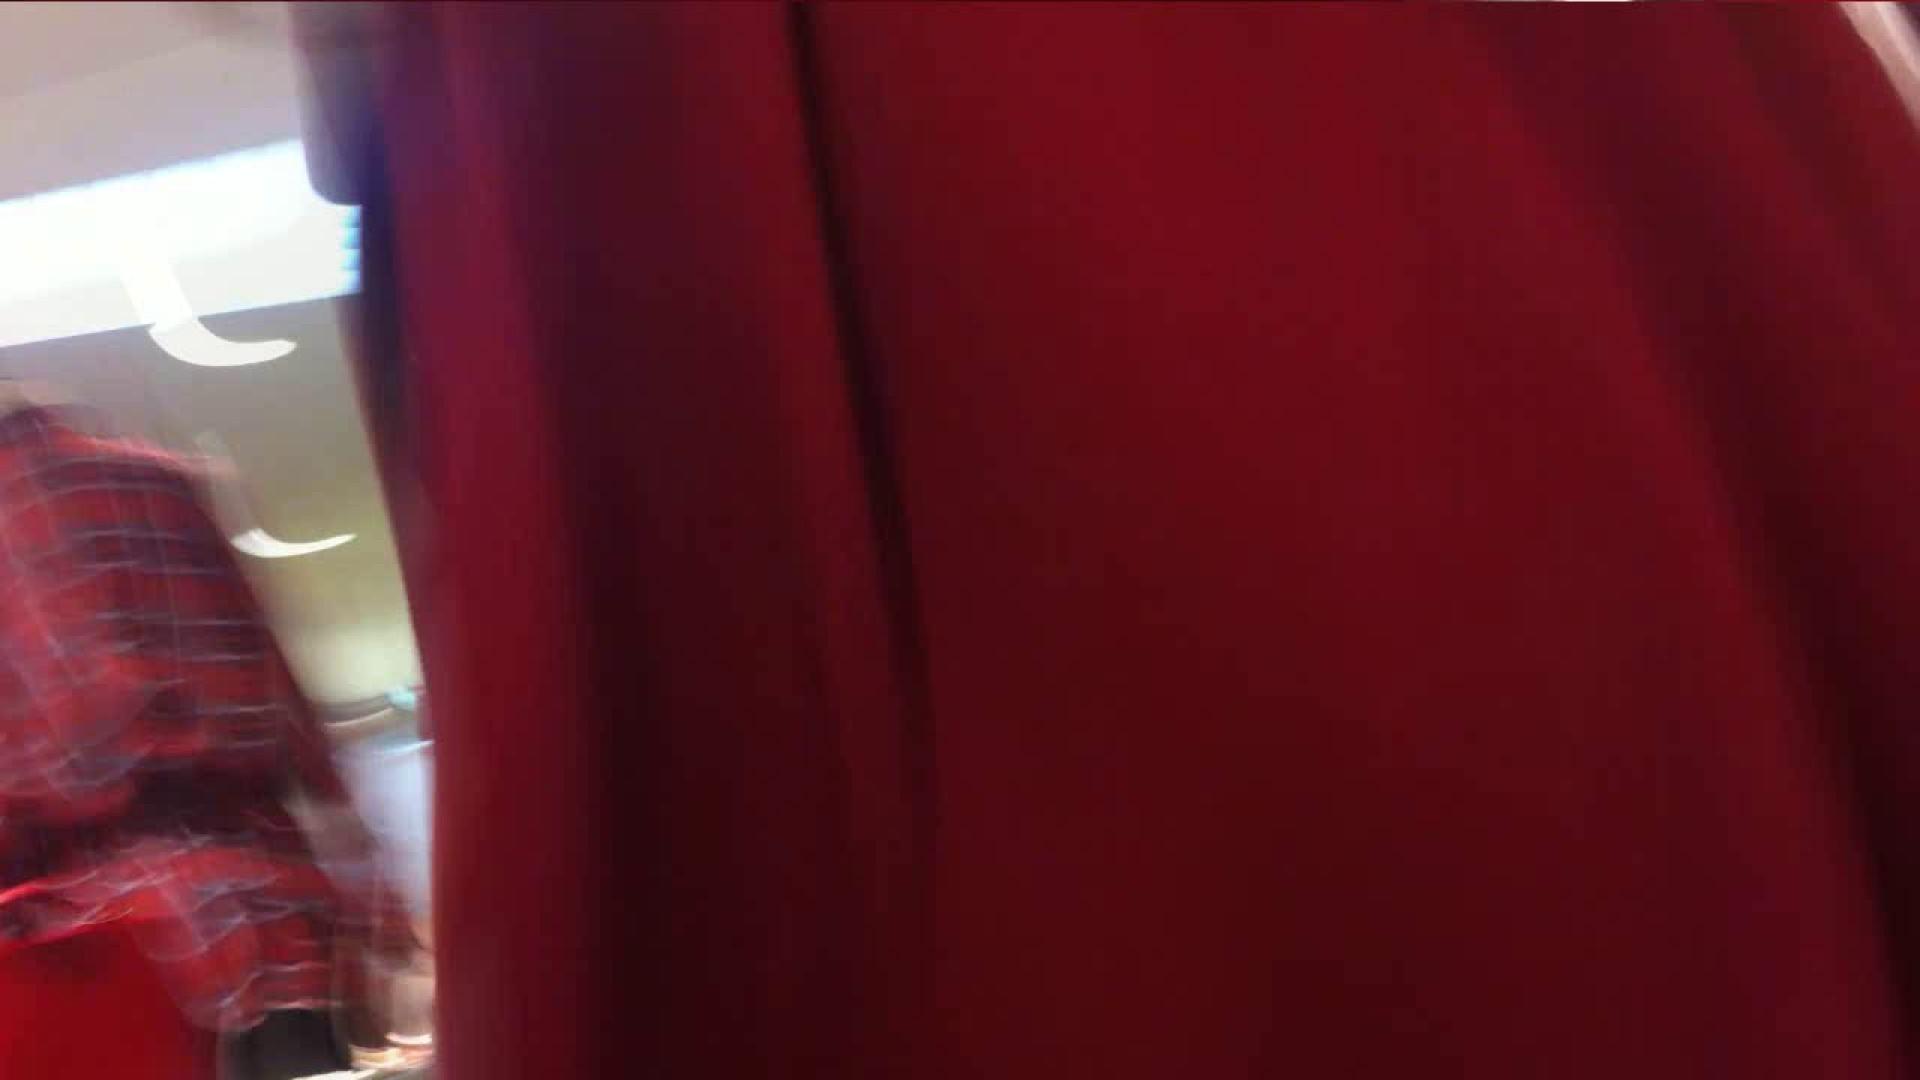 vol.33 美人アパレル胸チラ&パンチラ ギャル系ネーチャンの下着 接写 おまんこ動画流出 92pic 18